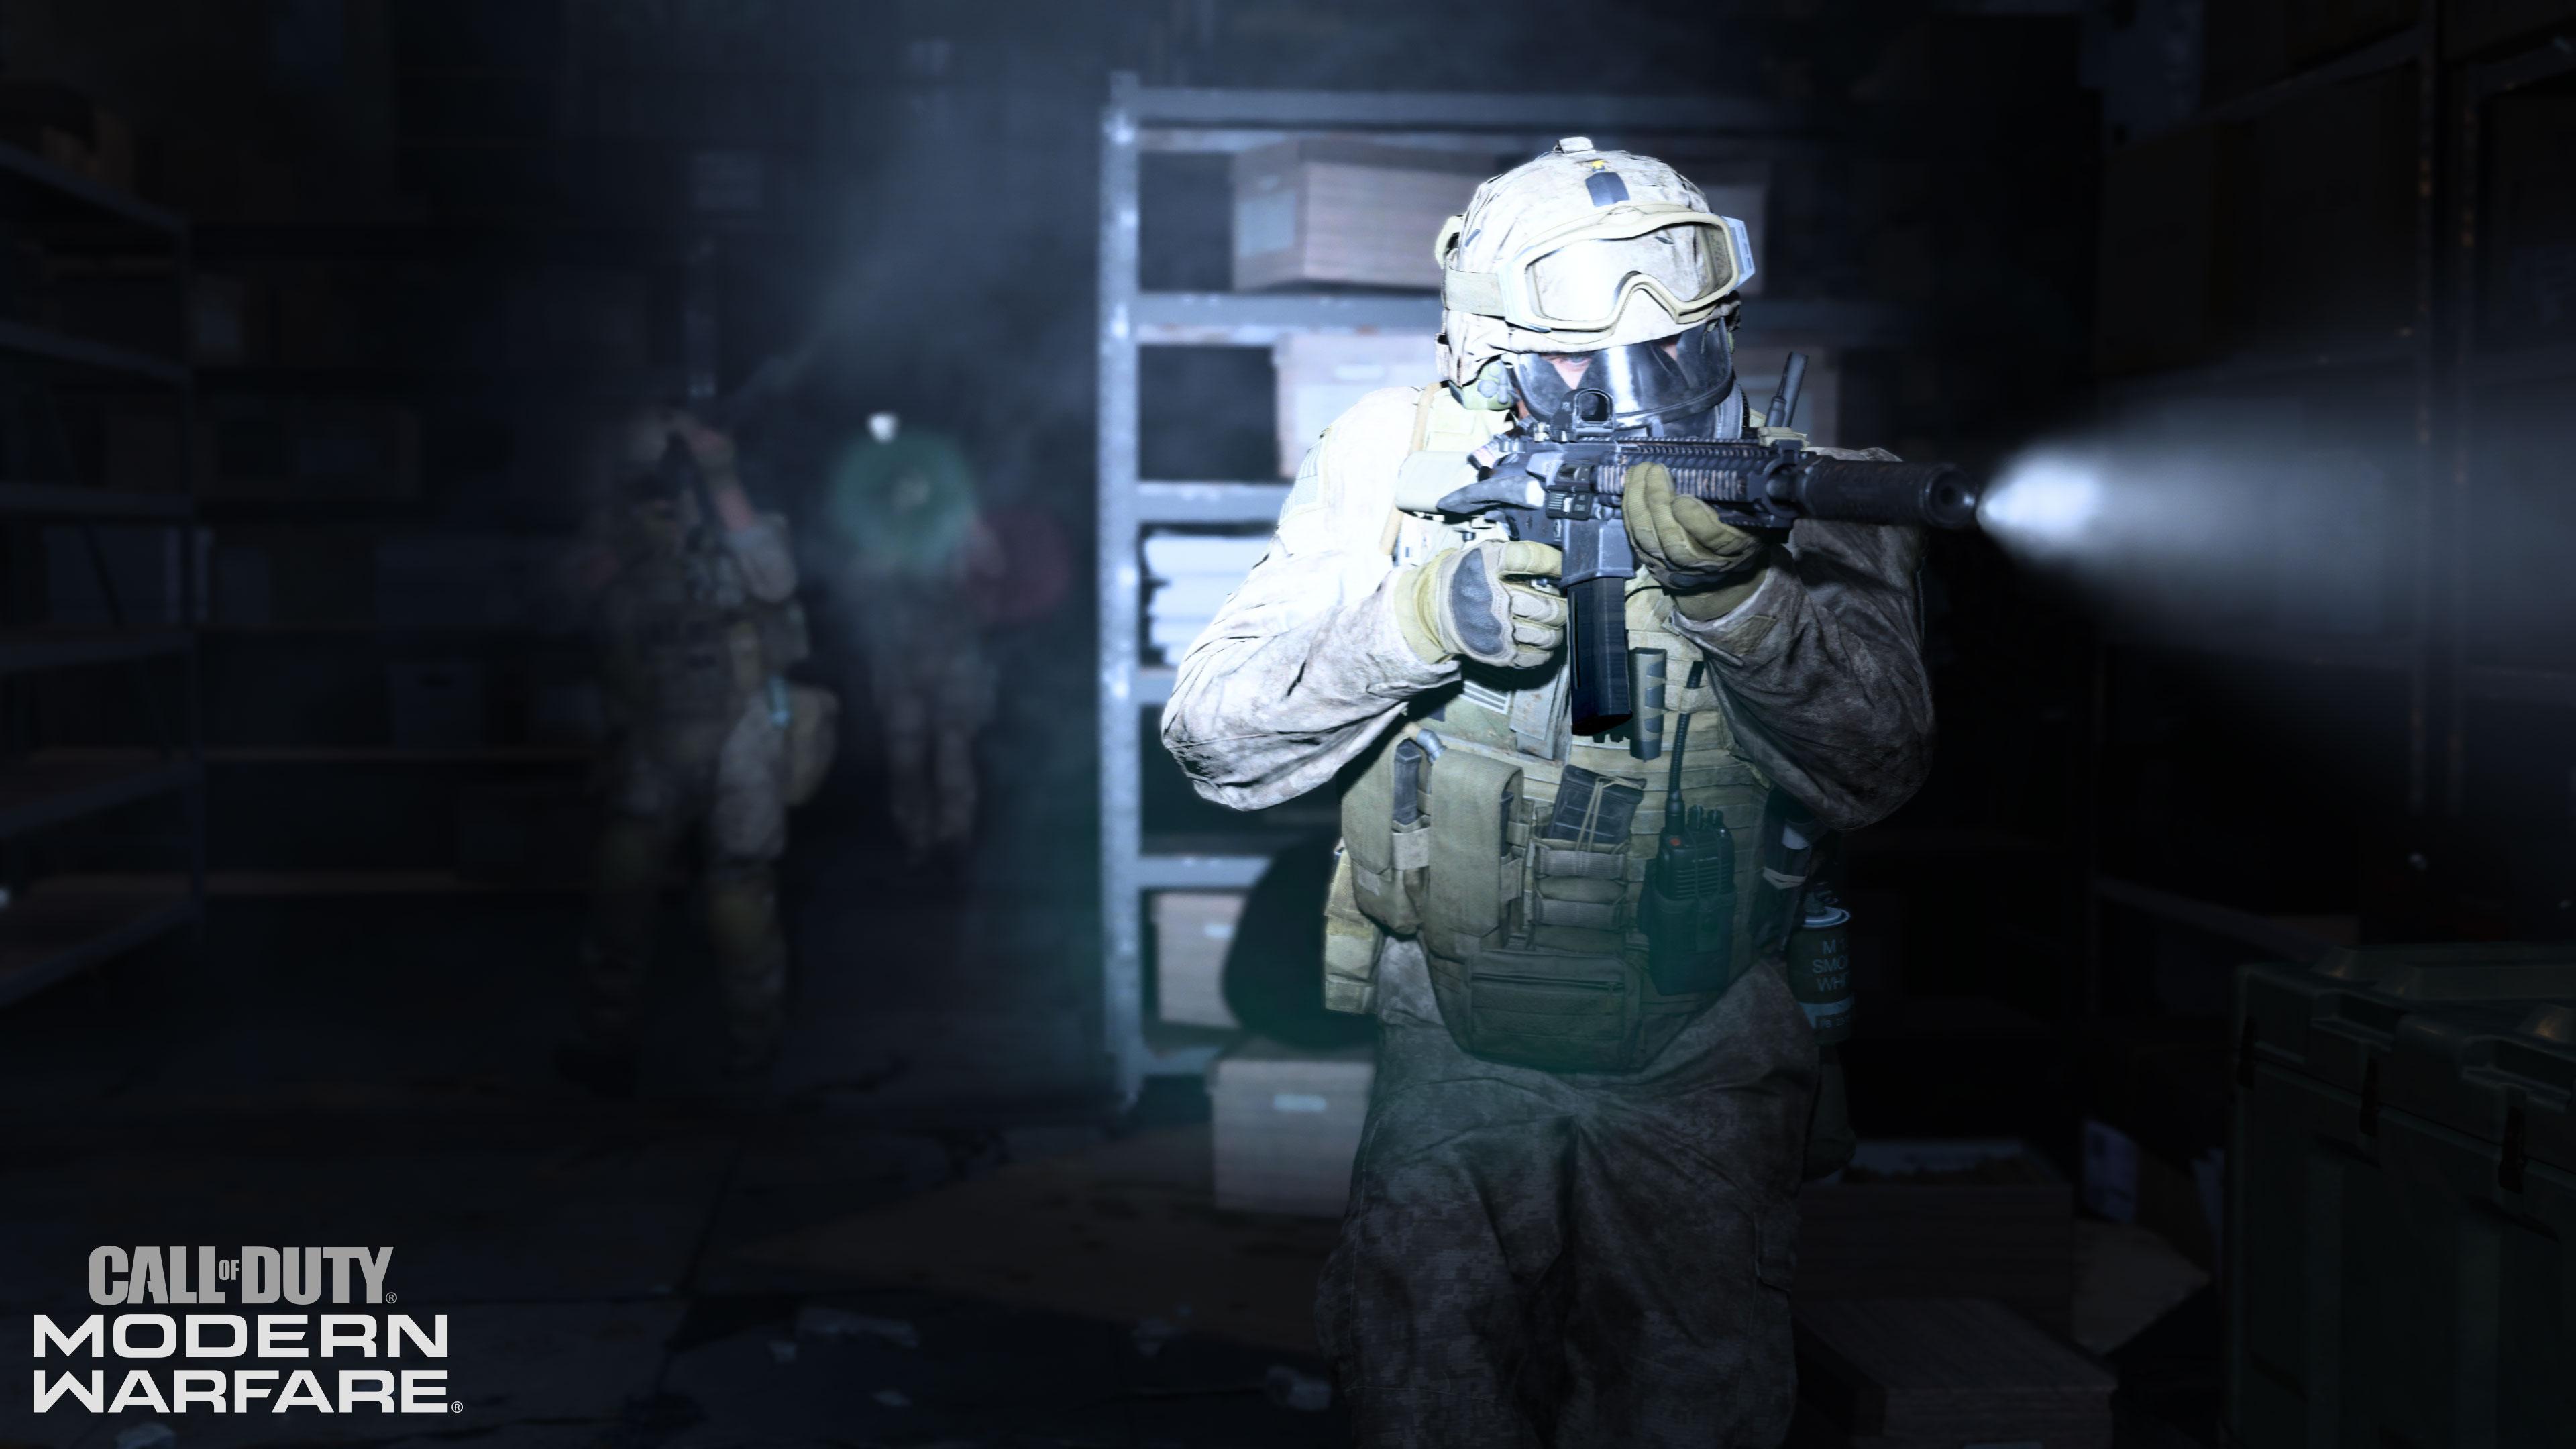 A soldier moves through a dark room, a flashlight attached to his gun